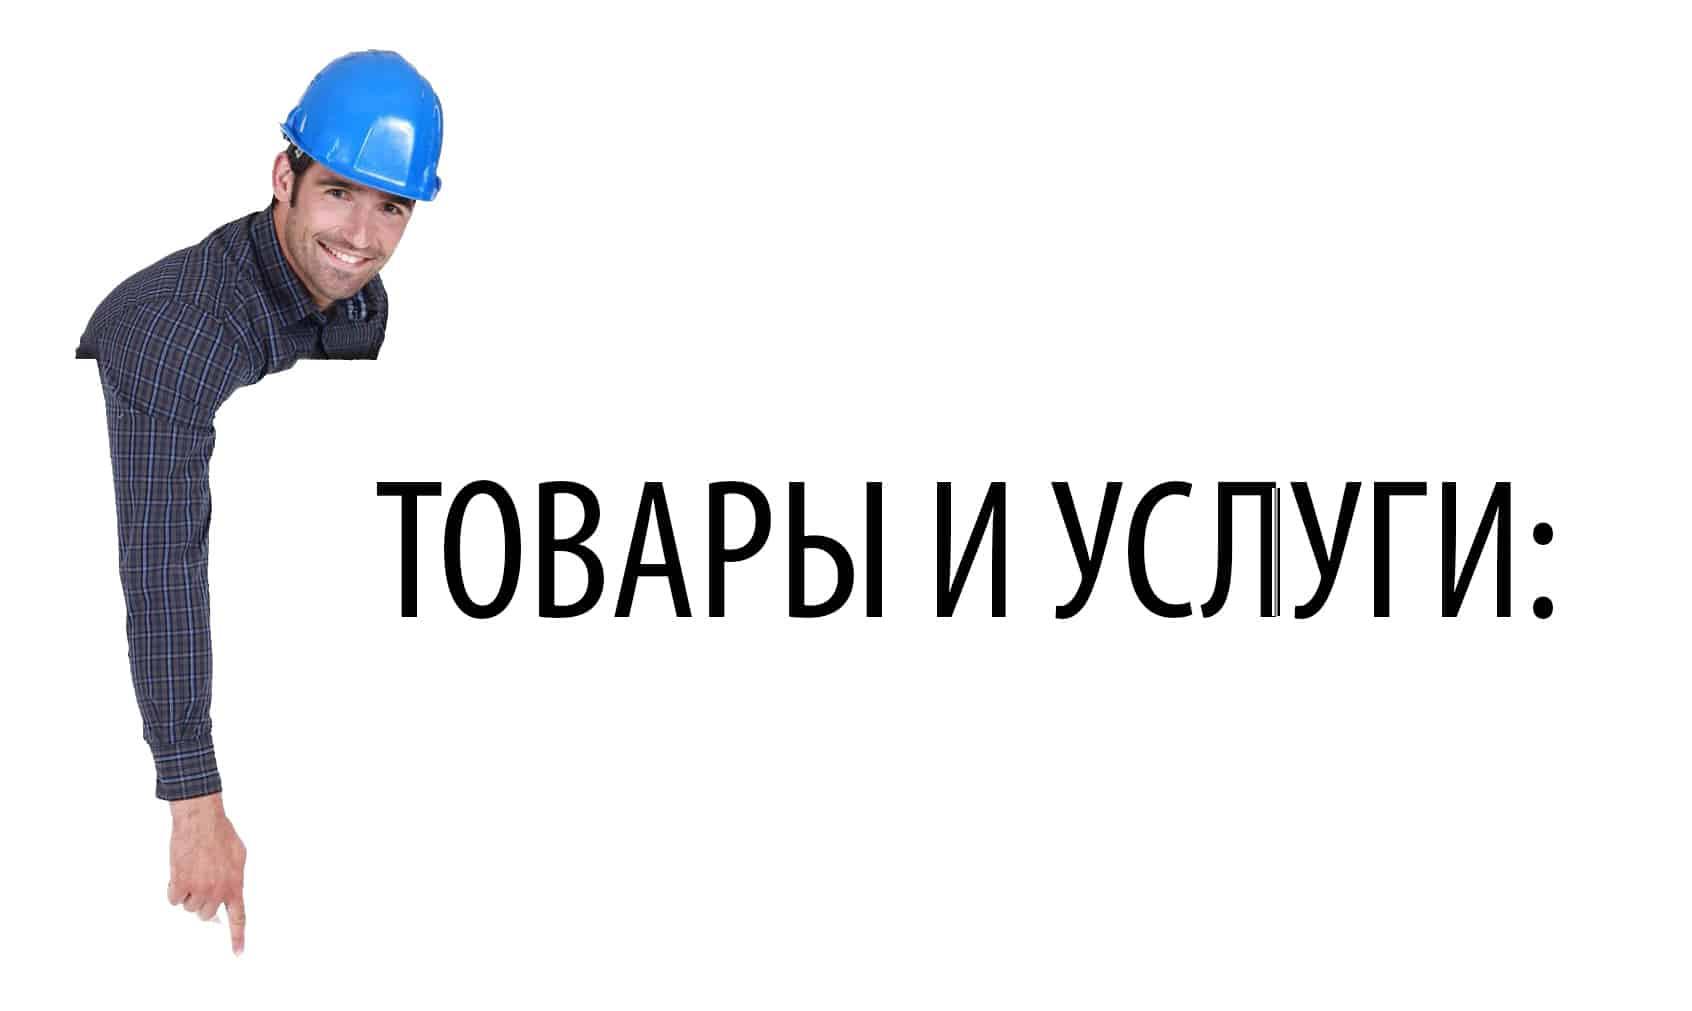 КАТАЛОГ САЙТА: